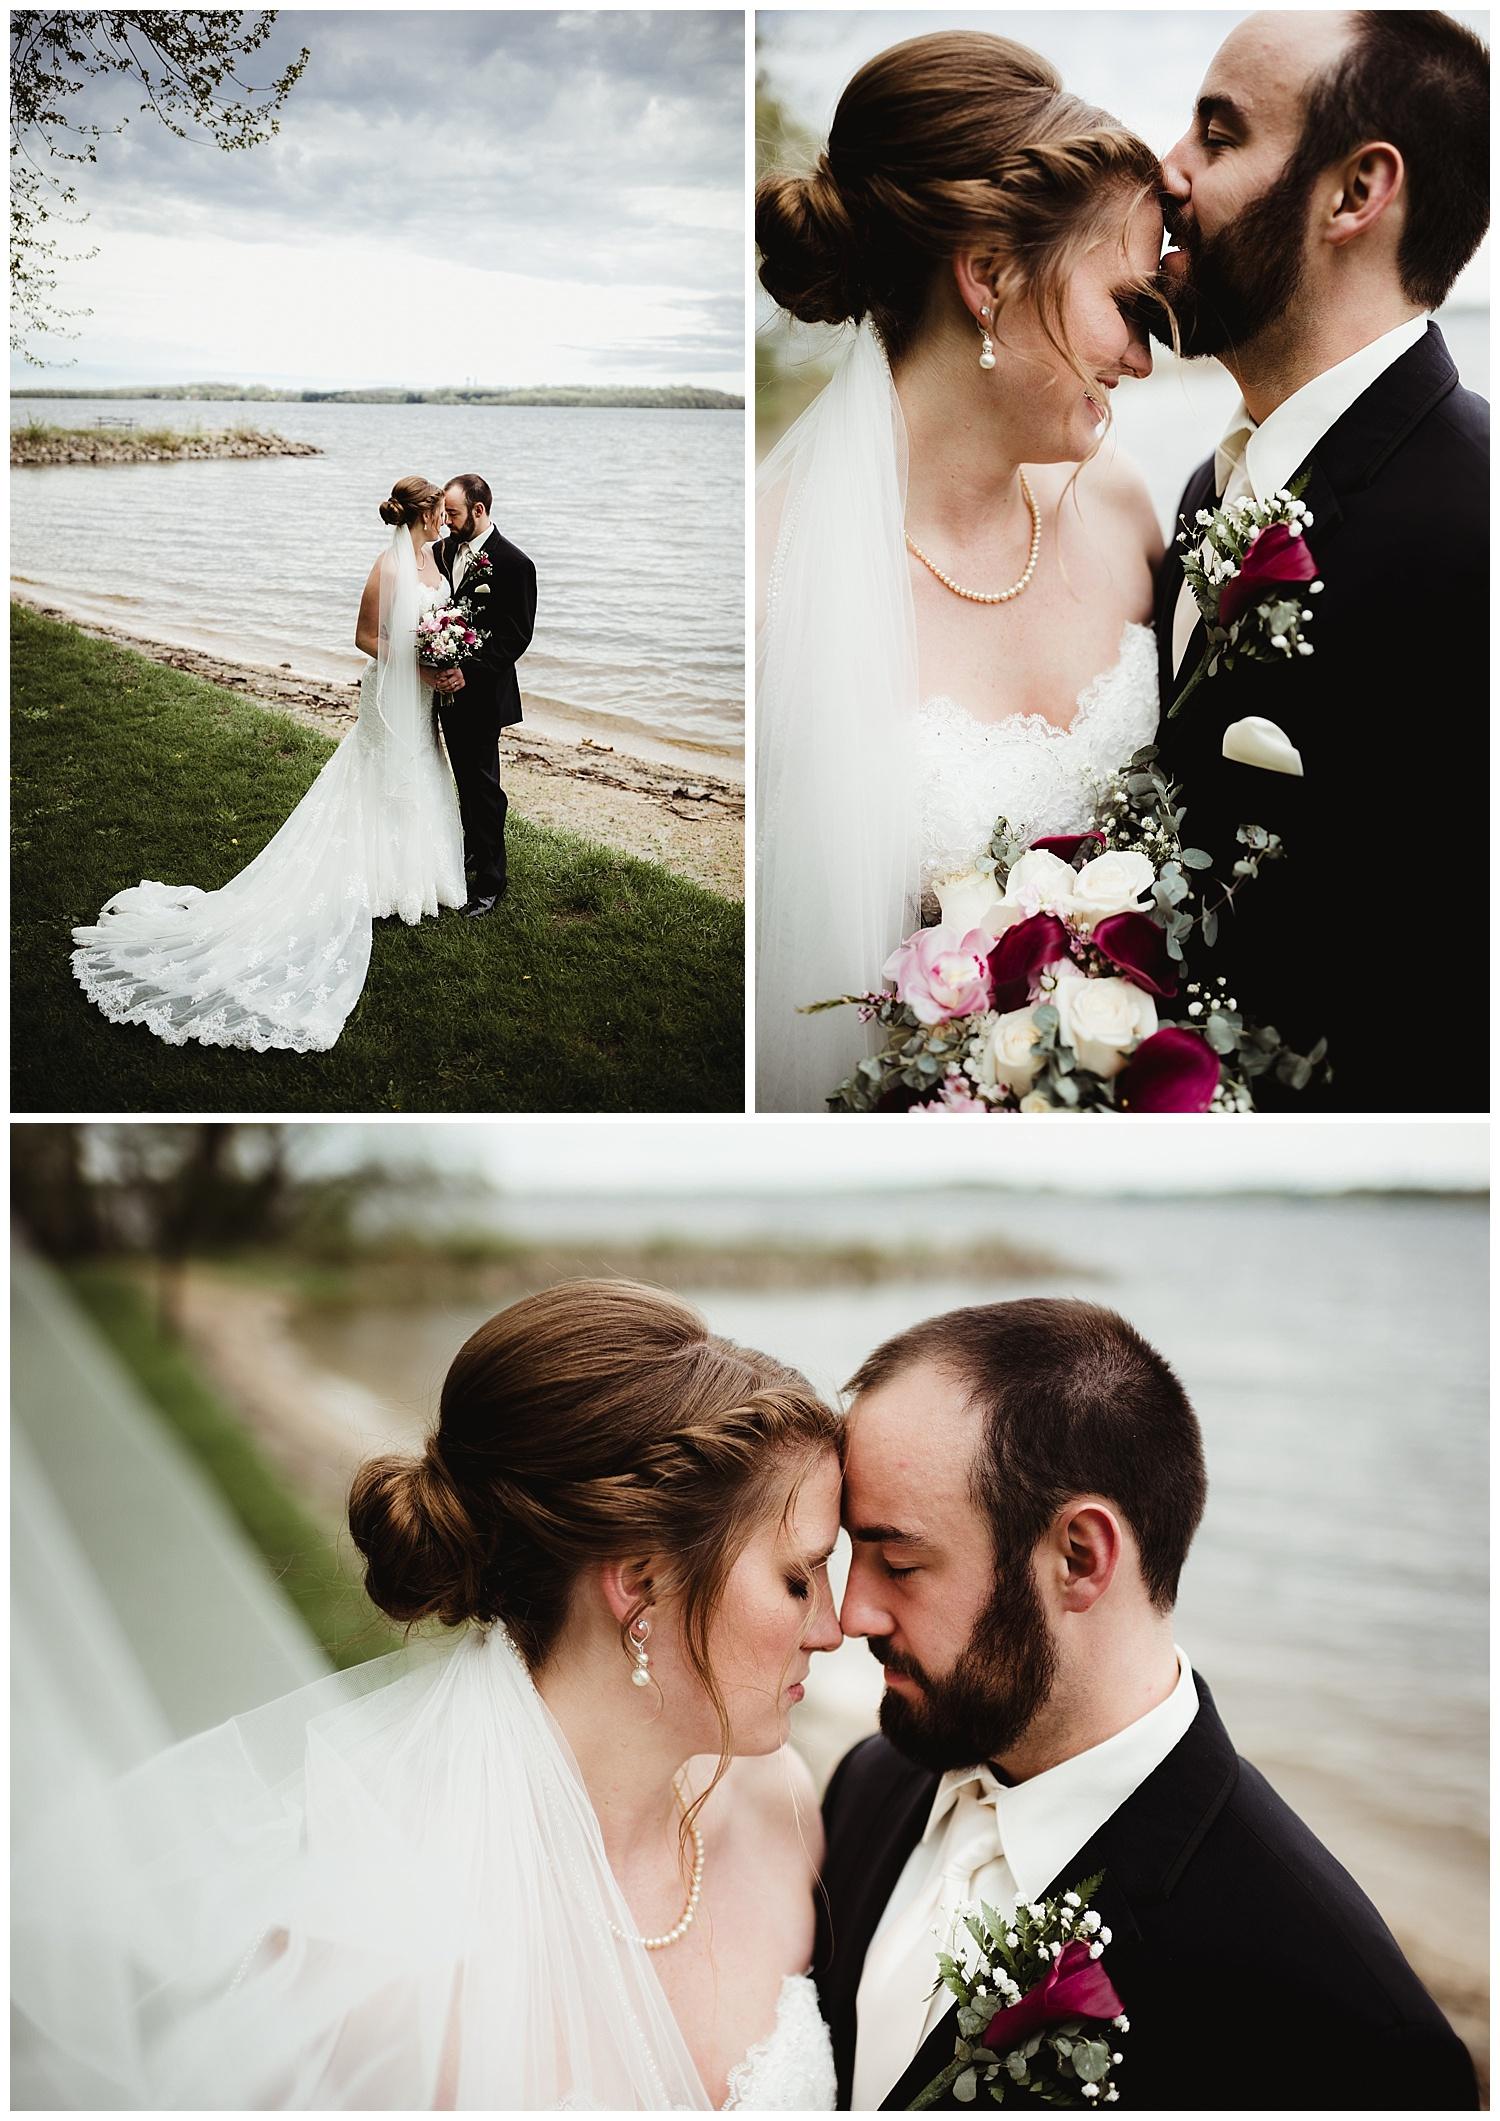 bridal portrait wisconsin wedding photographer Kayla E. Photography.jpg